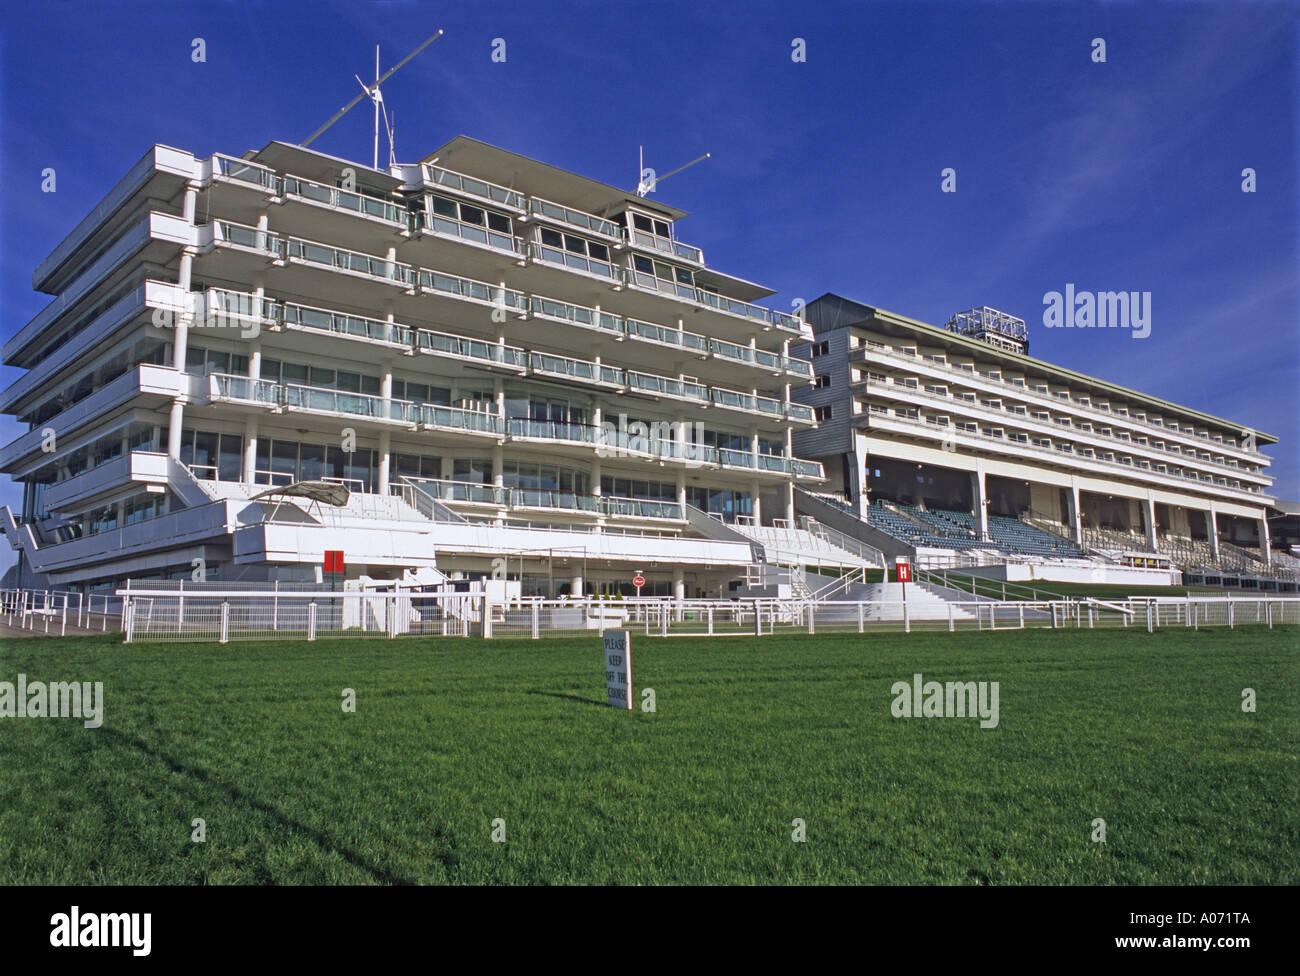 """Epsom ^Racecourse ^Tribuna, 'Epsom Downs, Surrey ^'' Imagen De Stock"